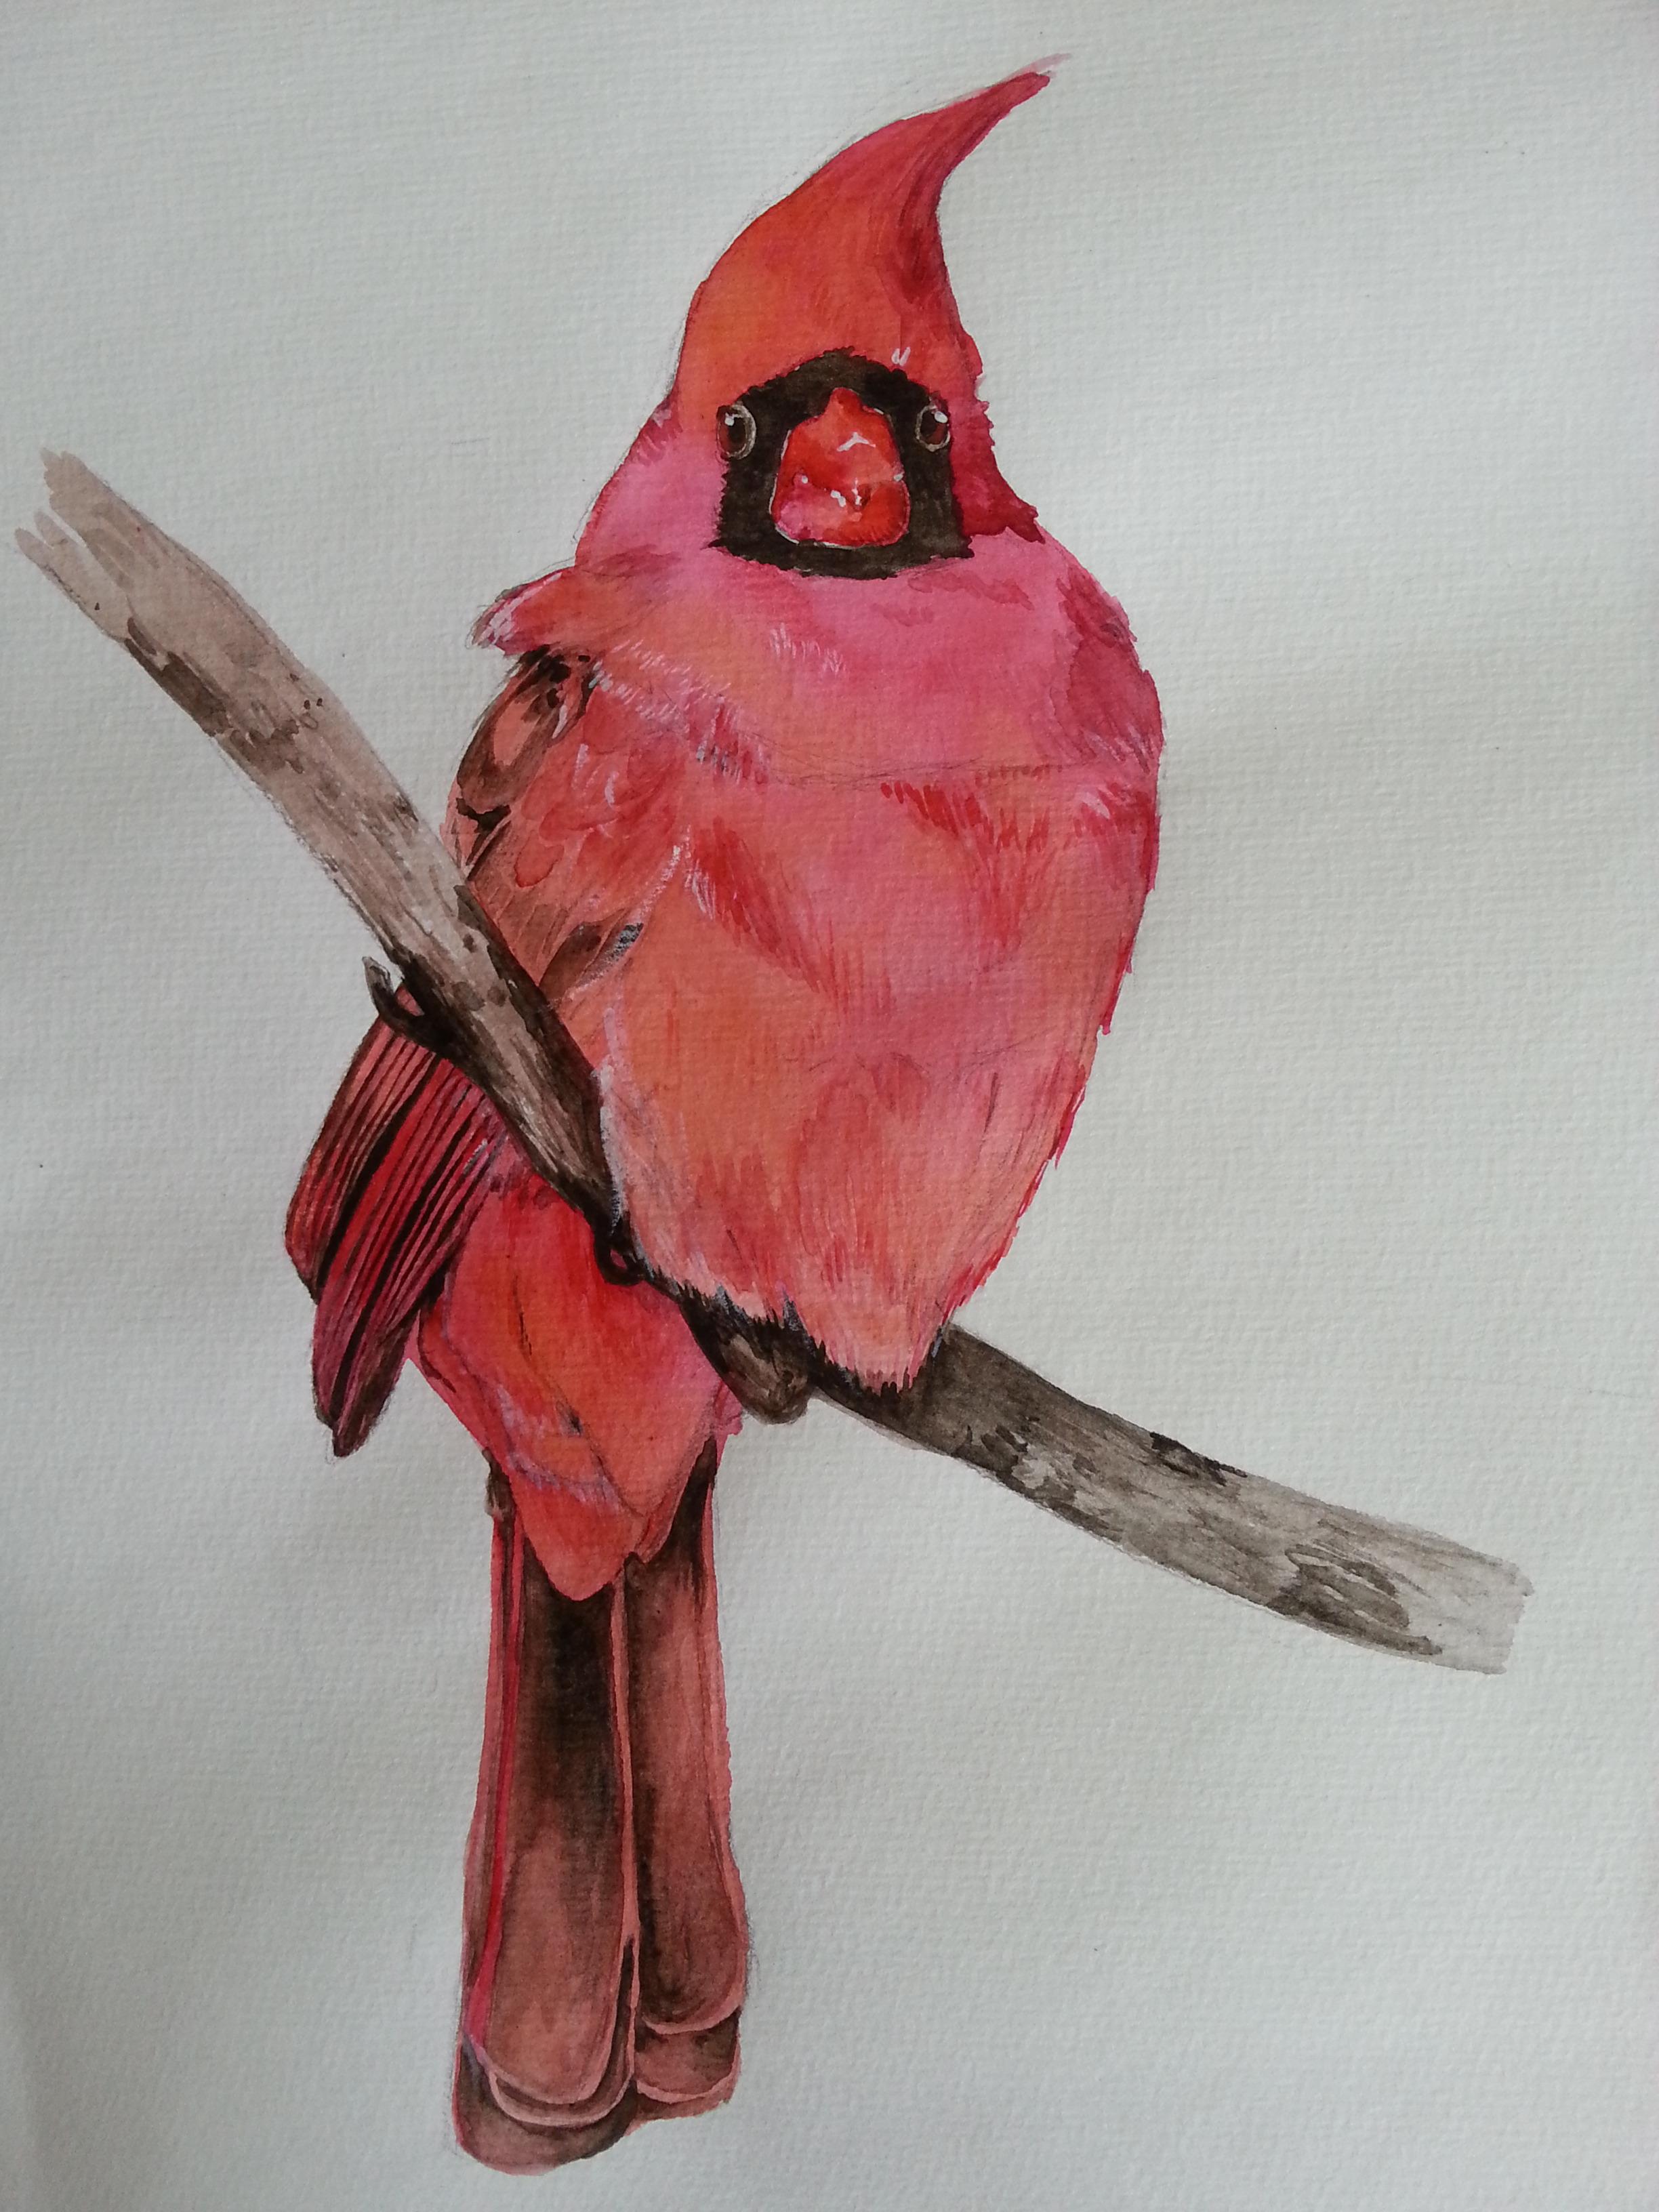 Northern cardinal by sanzoshing